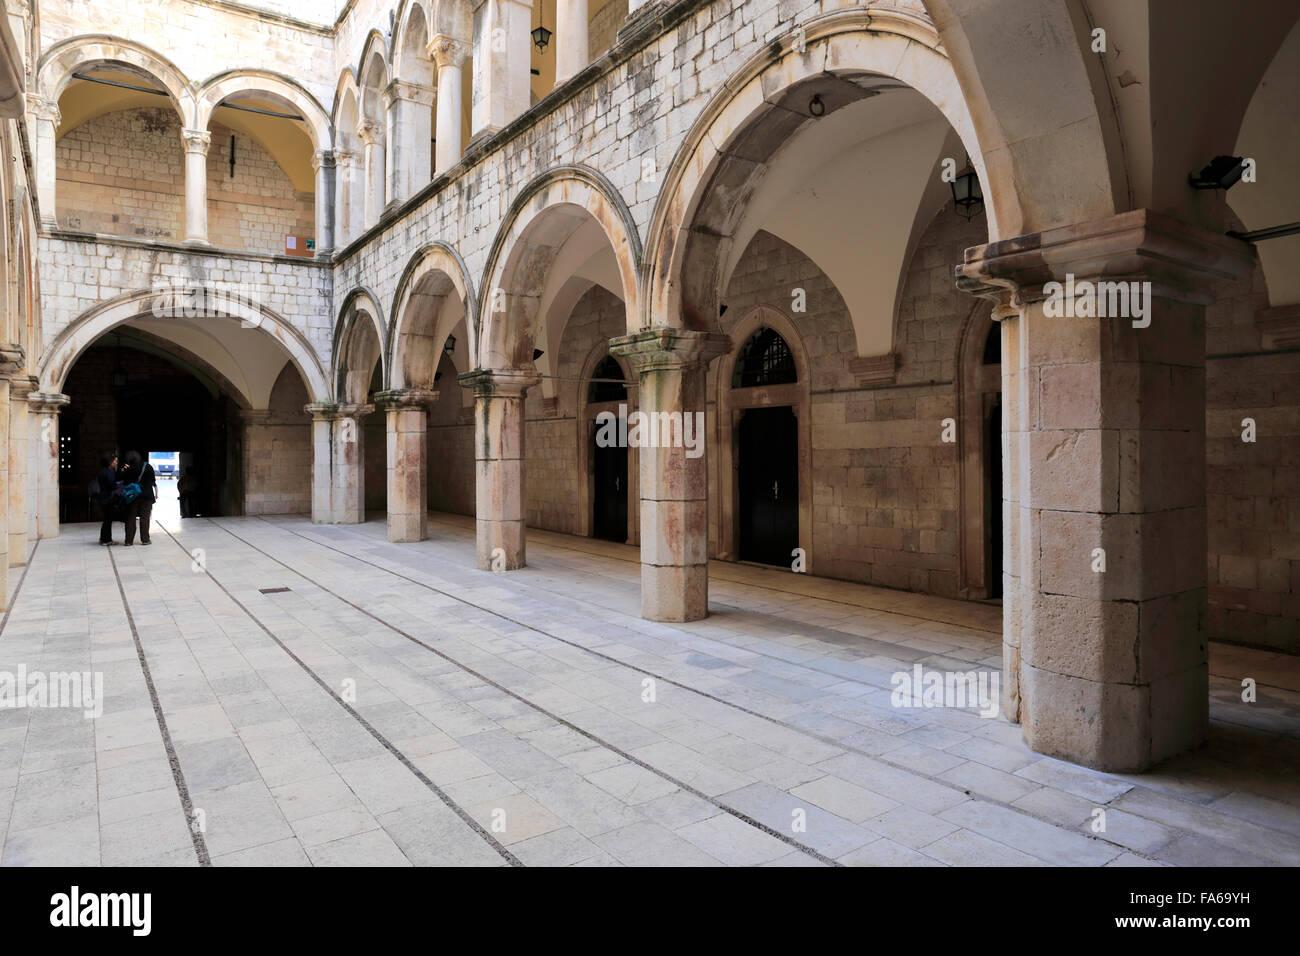 The Memorial Rooms in the Sponza palace, Main Street of Dubrovnik, Dubrovnik-Neretva County, Dalmatian coast, Adriatic - Stock Image